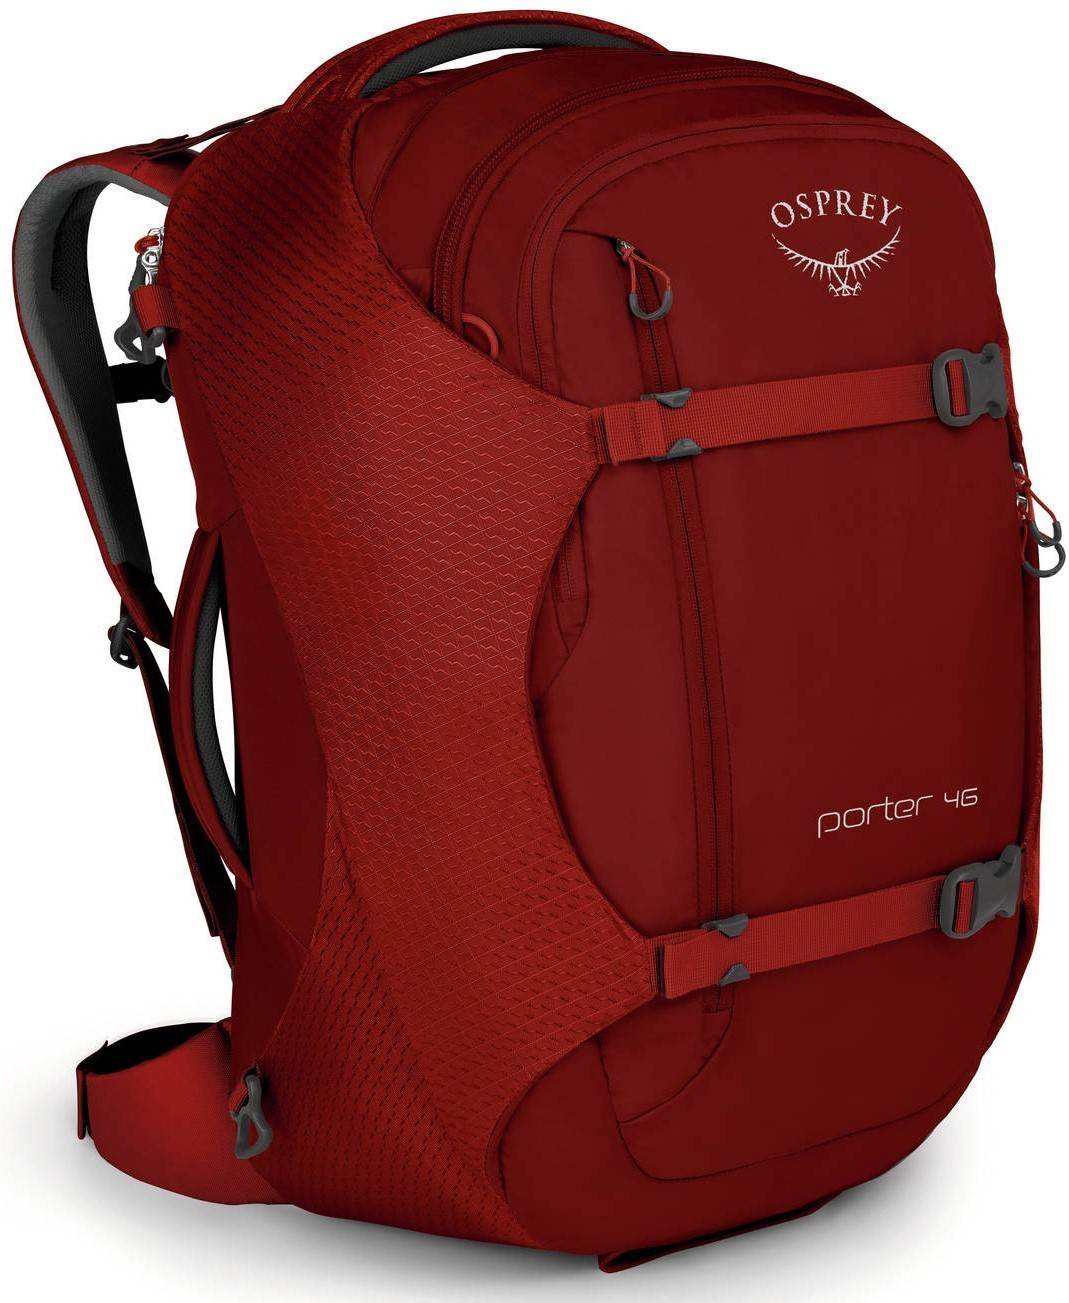 Сумки-рюкзаки Сумка-рюкзак Osprey Porter 46 Diablo Red Porter_46_F17_Side_Diablo_Red_web.jpg